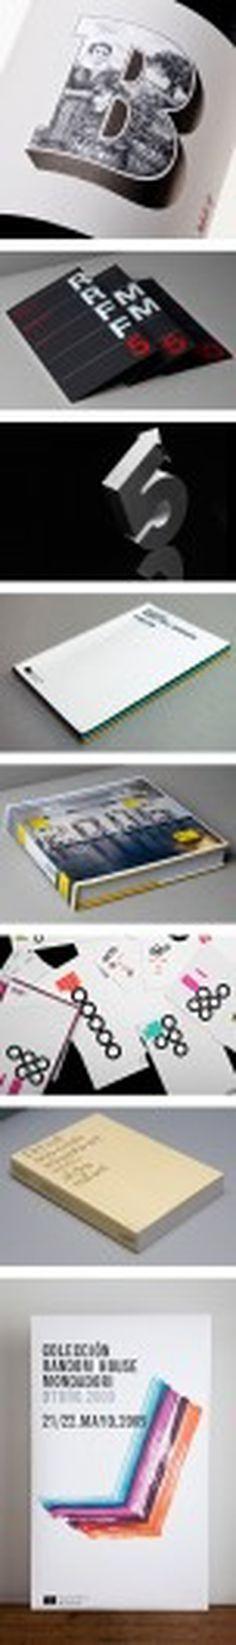 Bucamel, Bodegas Tierra de Orgaz « Eight:48 #design #graphic #poster #typography